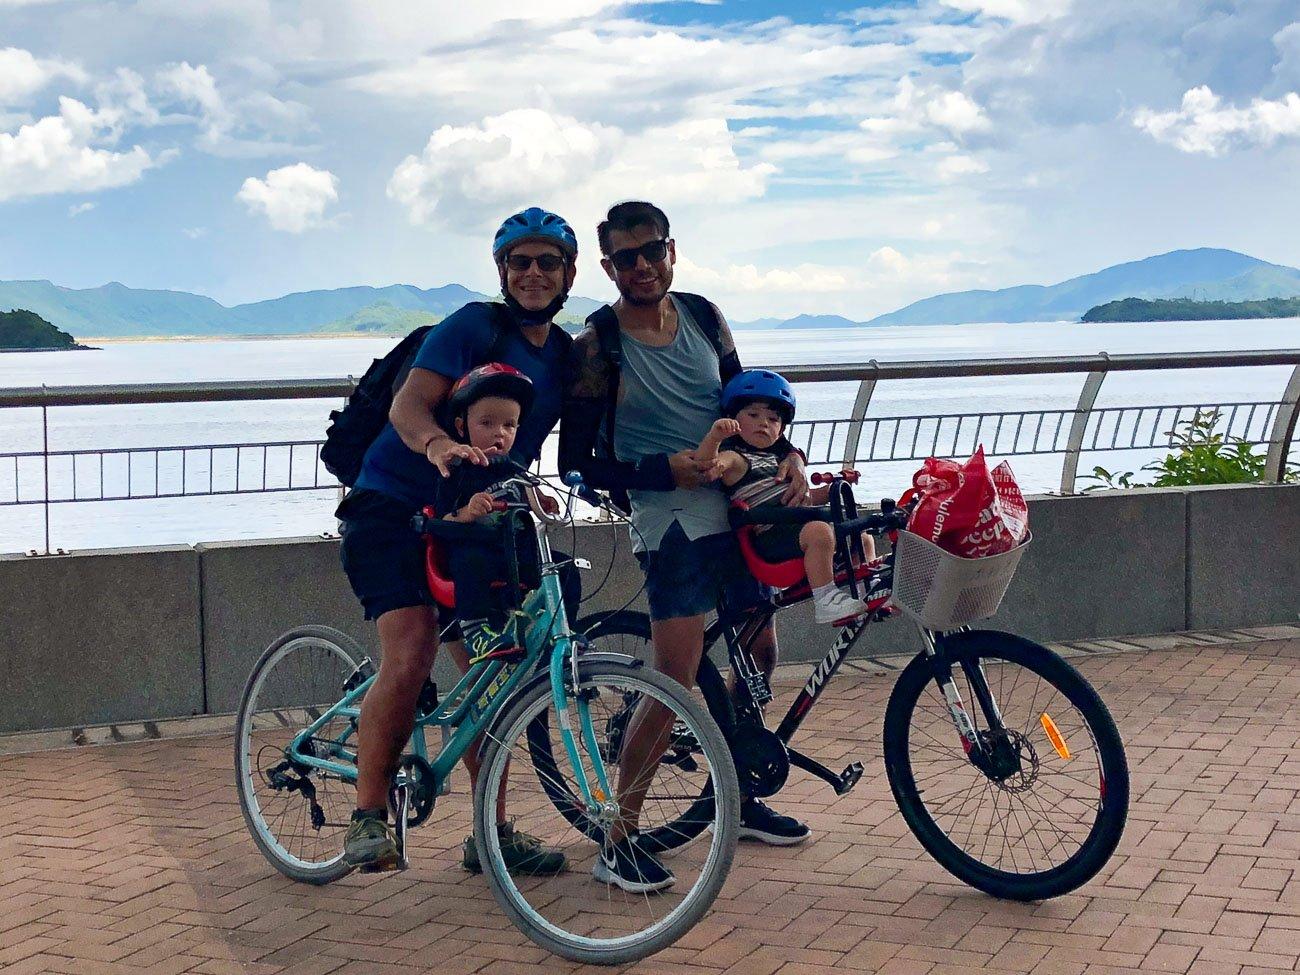 Family-Friendly-Cycling-In-Hong-Kong-COVER.jpg